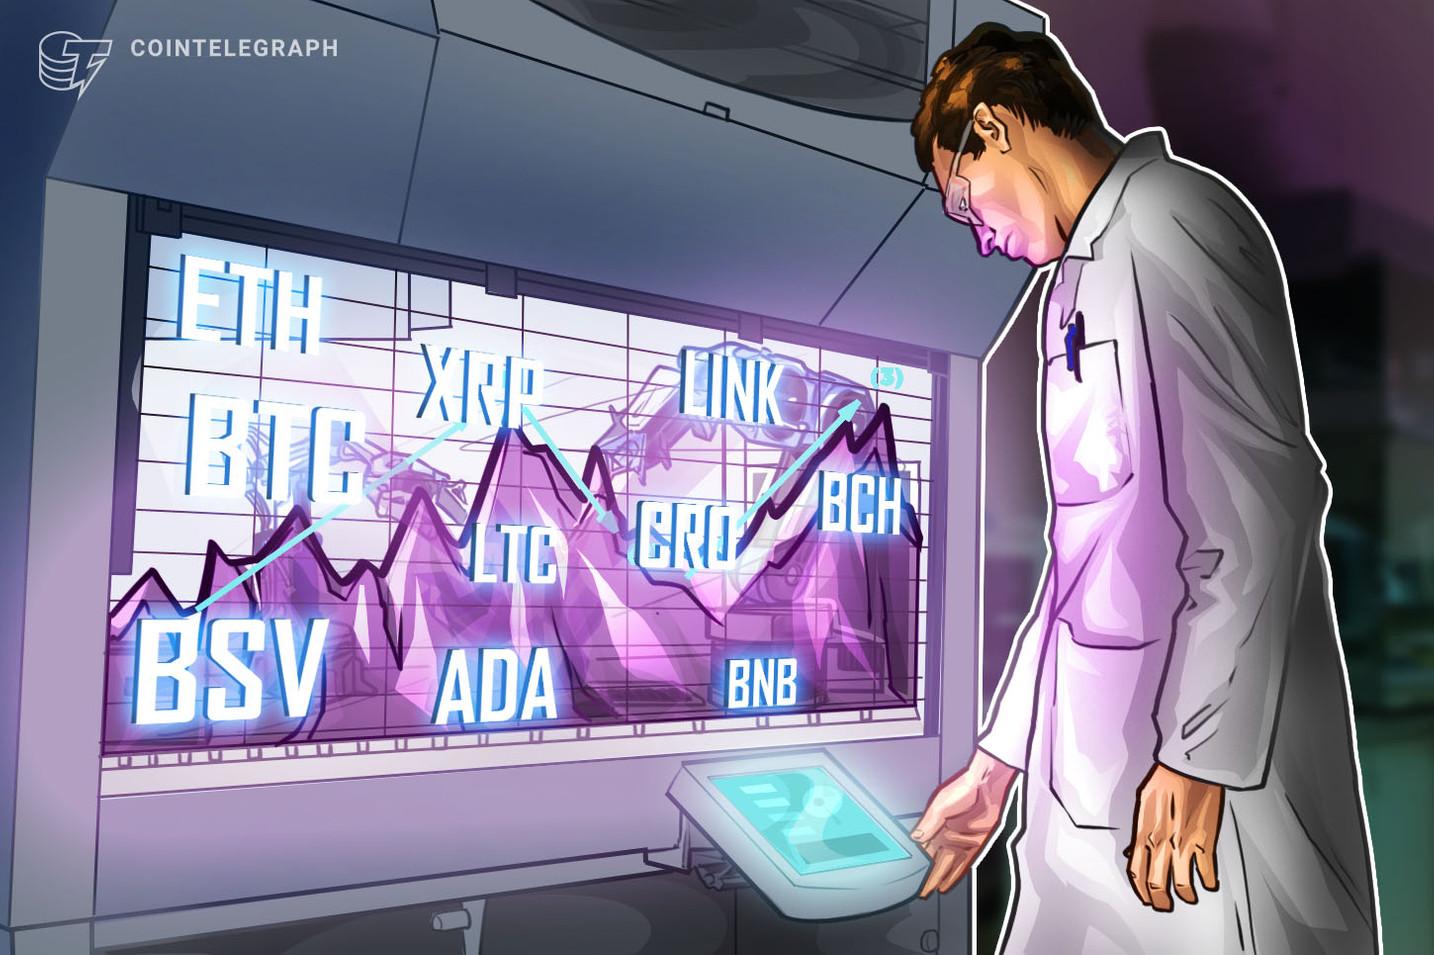 Análisis de precios al 22/7: BTC, ETH, XRP, BCH, BSV, ADA, LTC, CRO, LINK, BNB